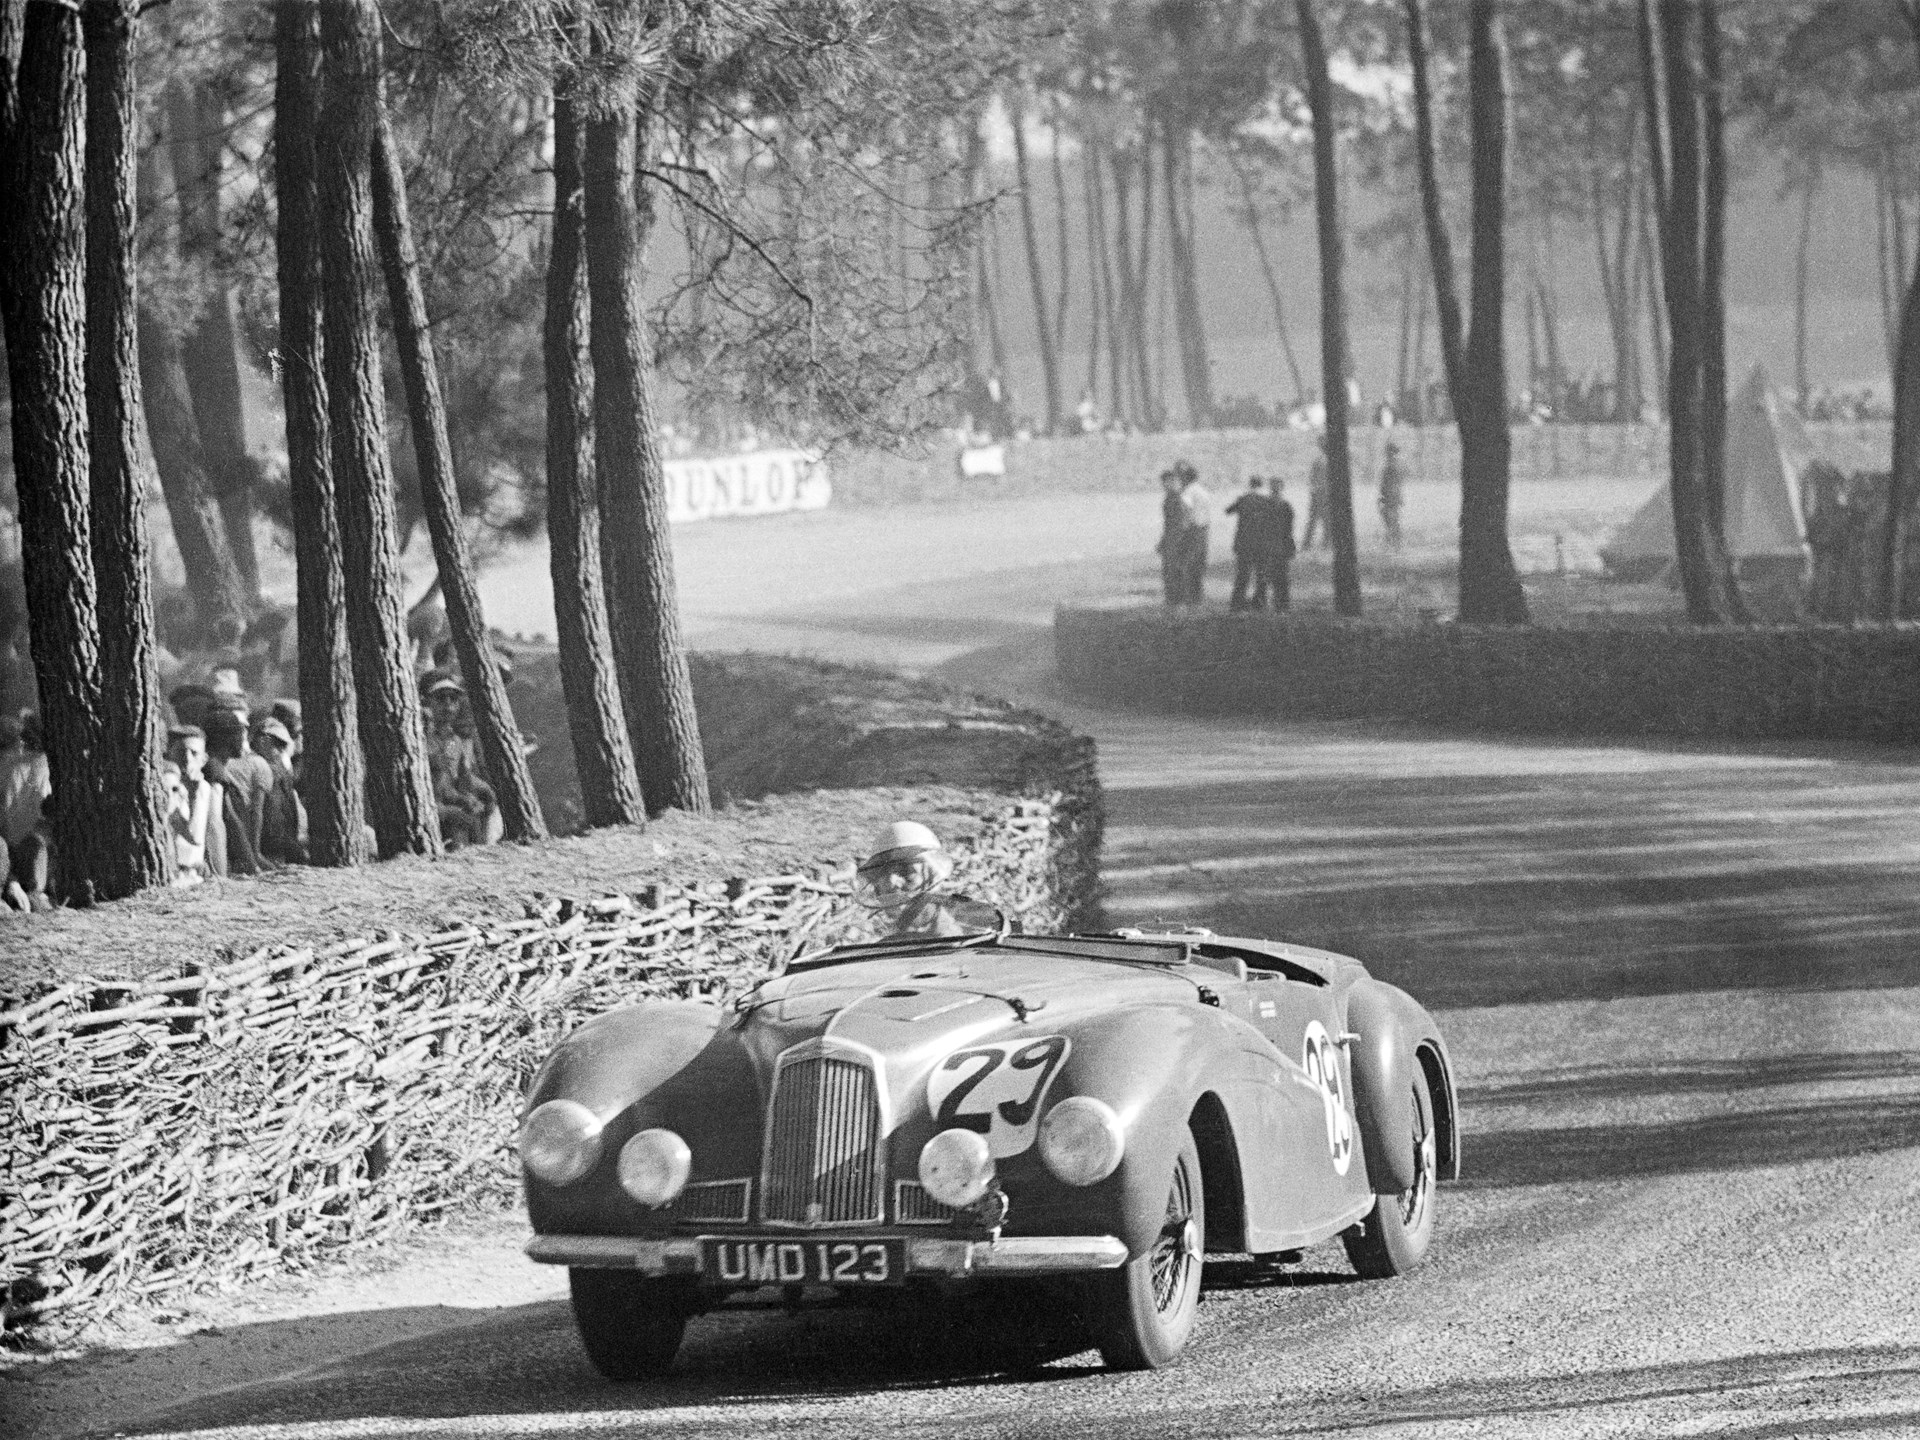 2-Litre Sports AMC/49/3 gracefully navigates the Esses of the Le Mans circuit.